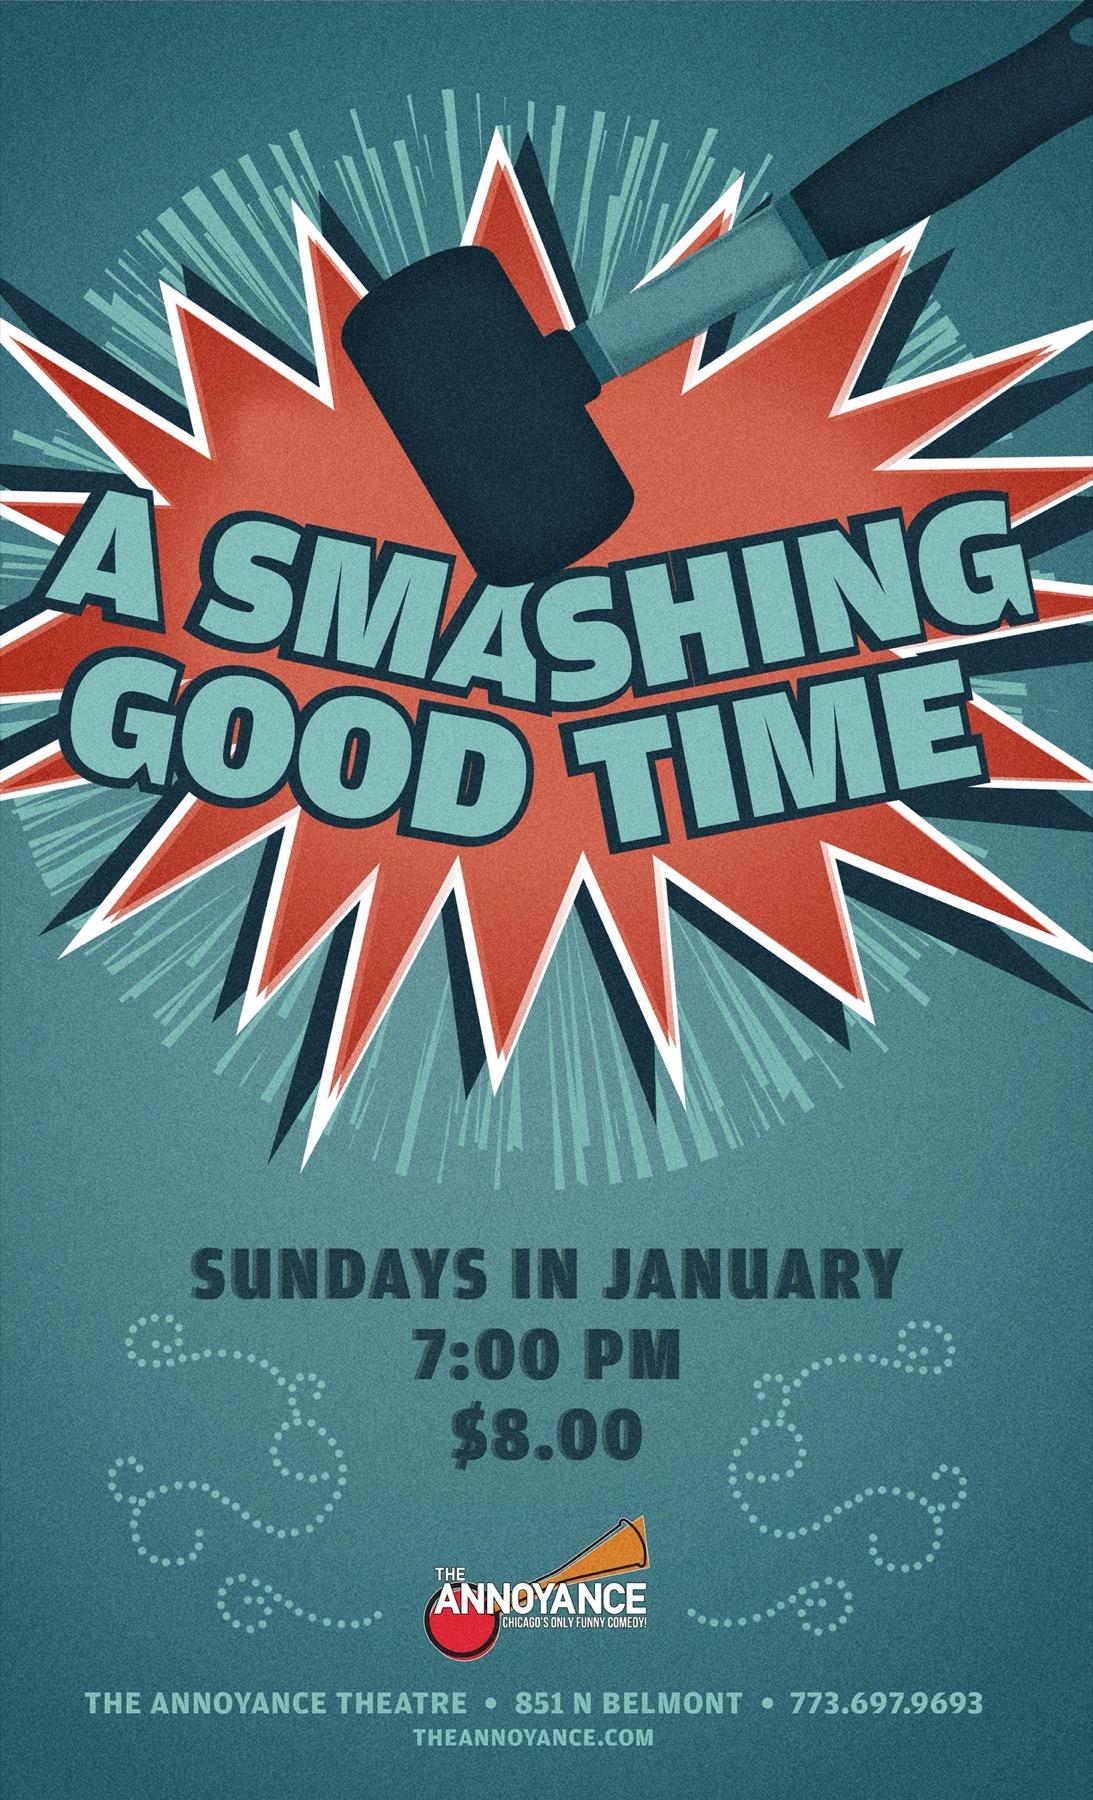 A Smashing Good Time